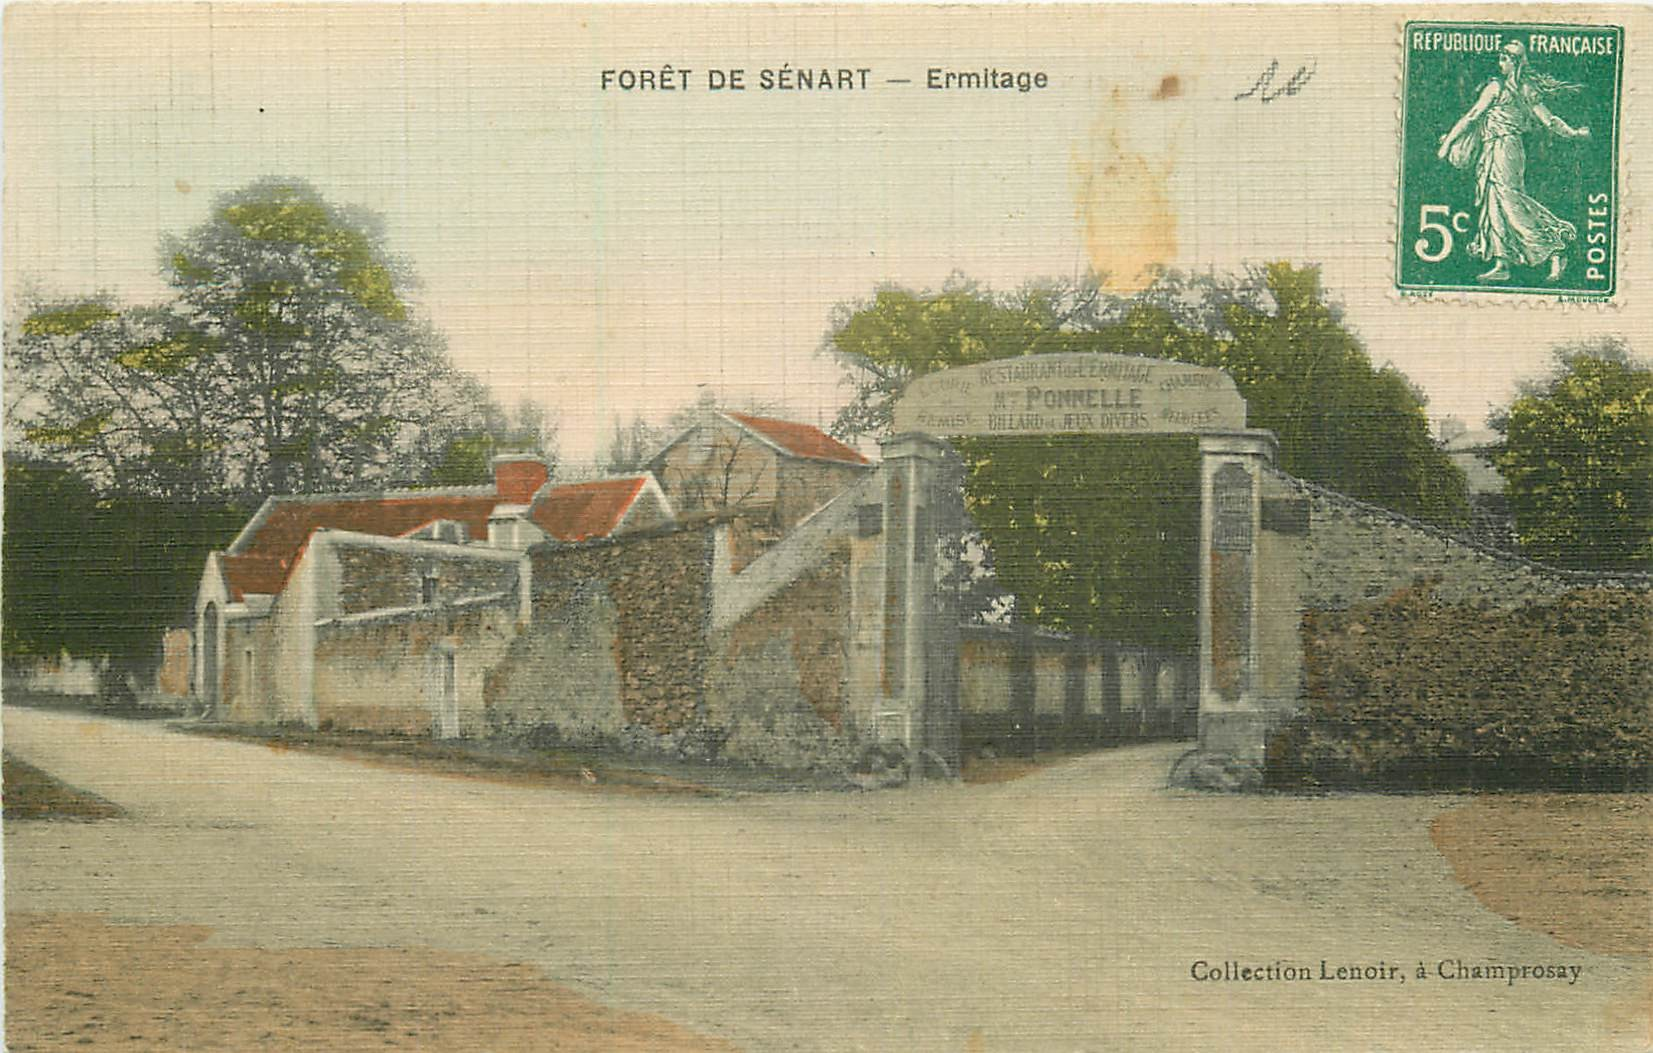 91 FORET DE SENART. Restaurant Ermitage